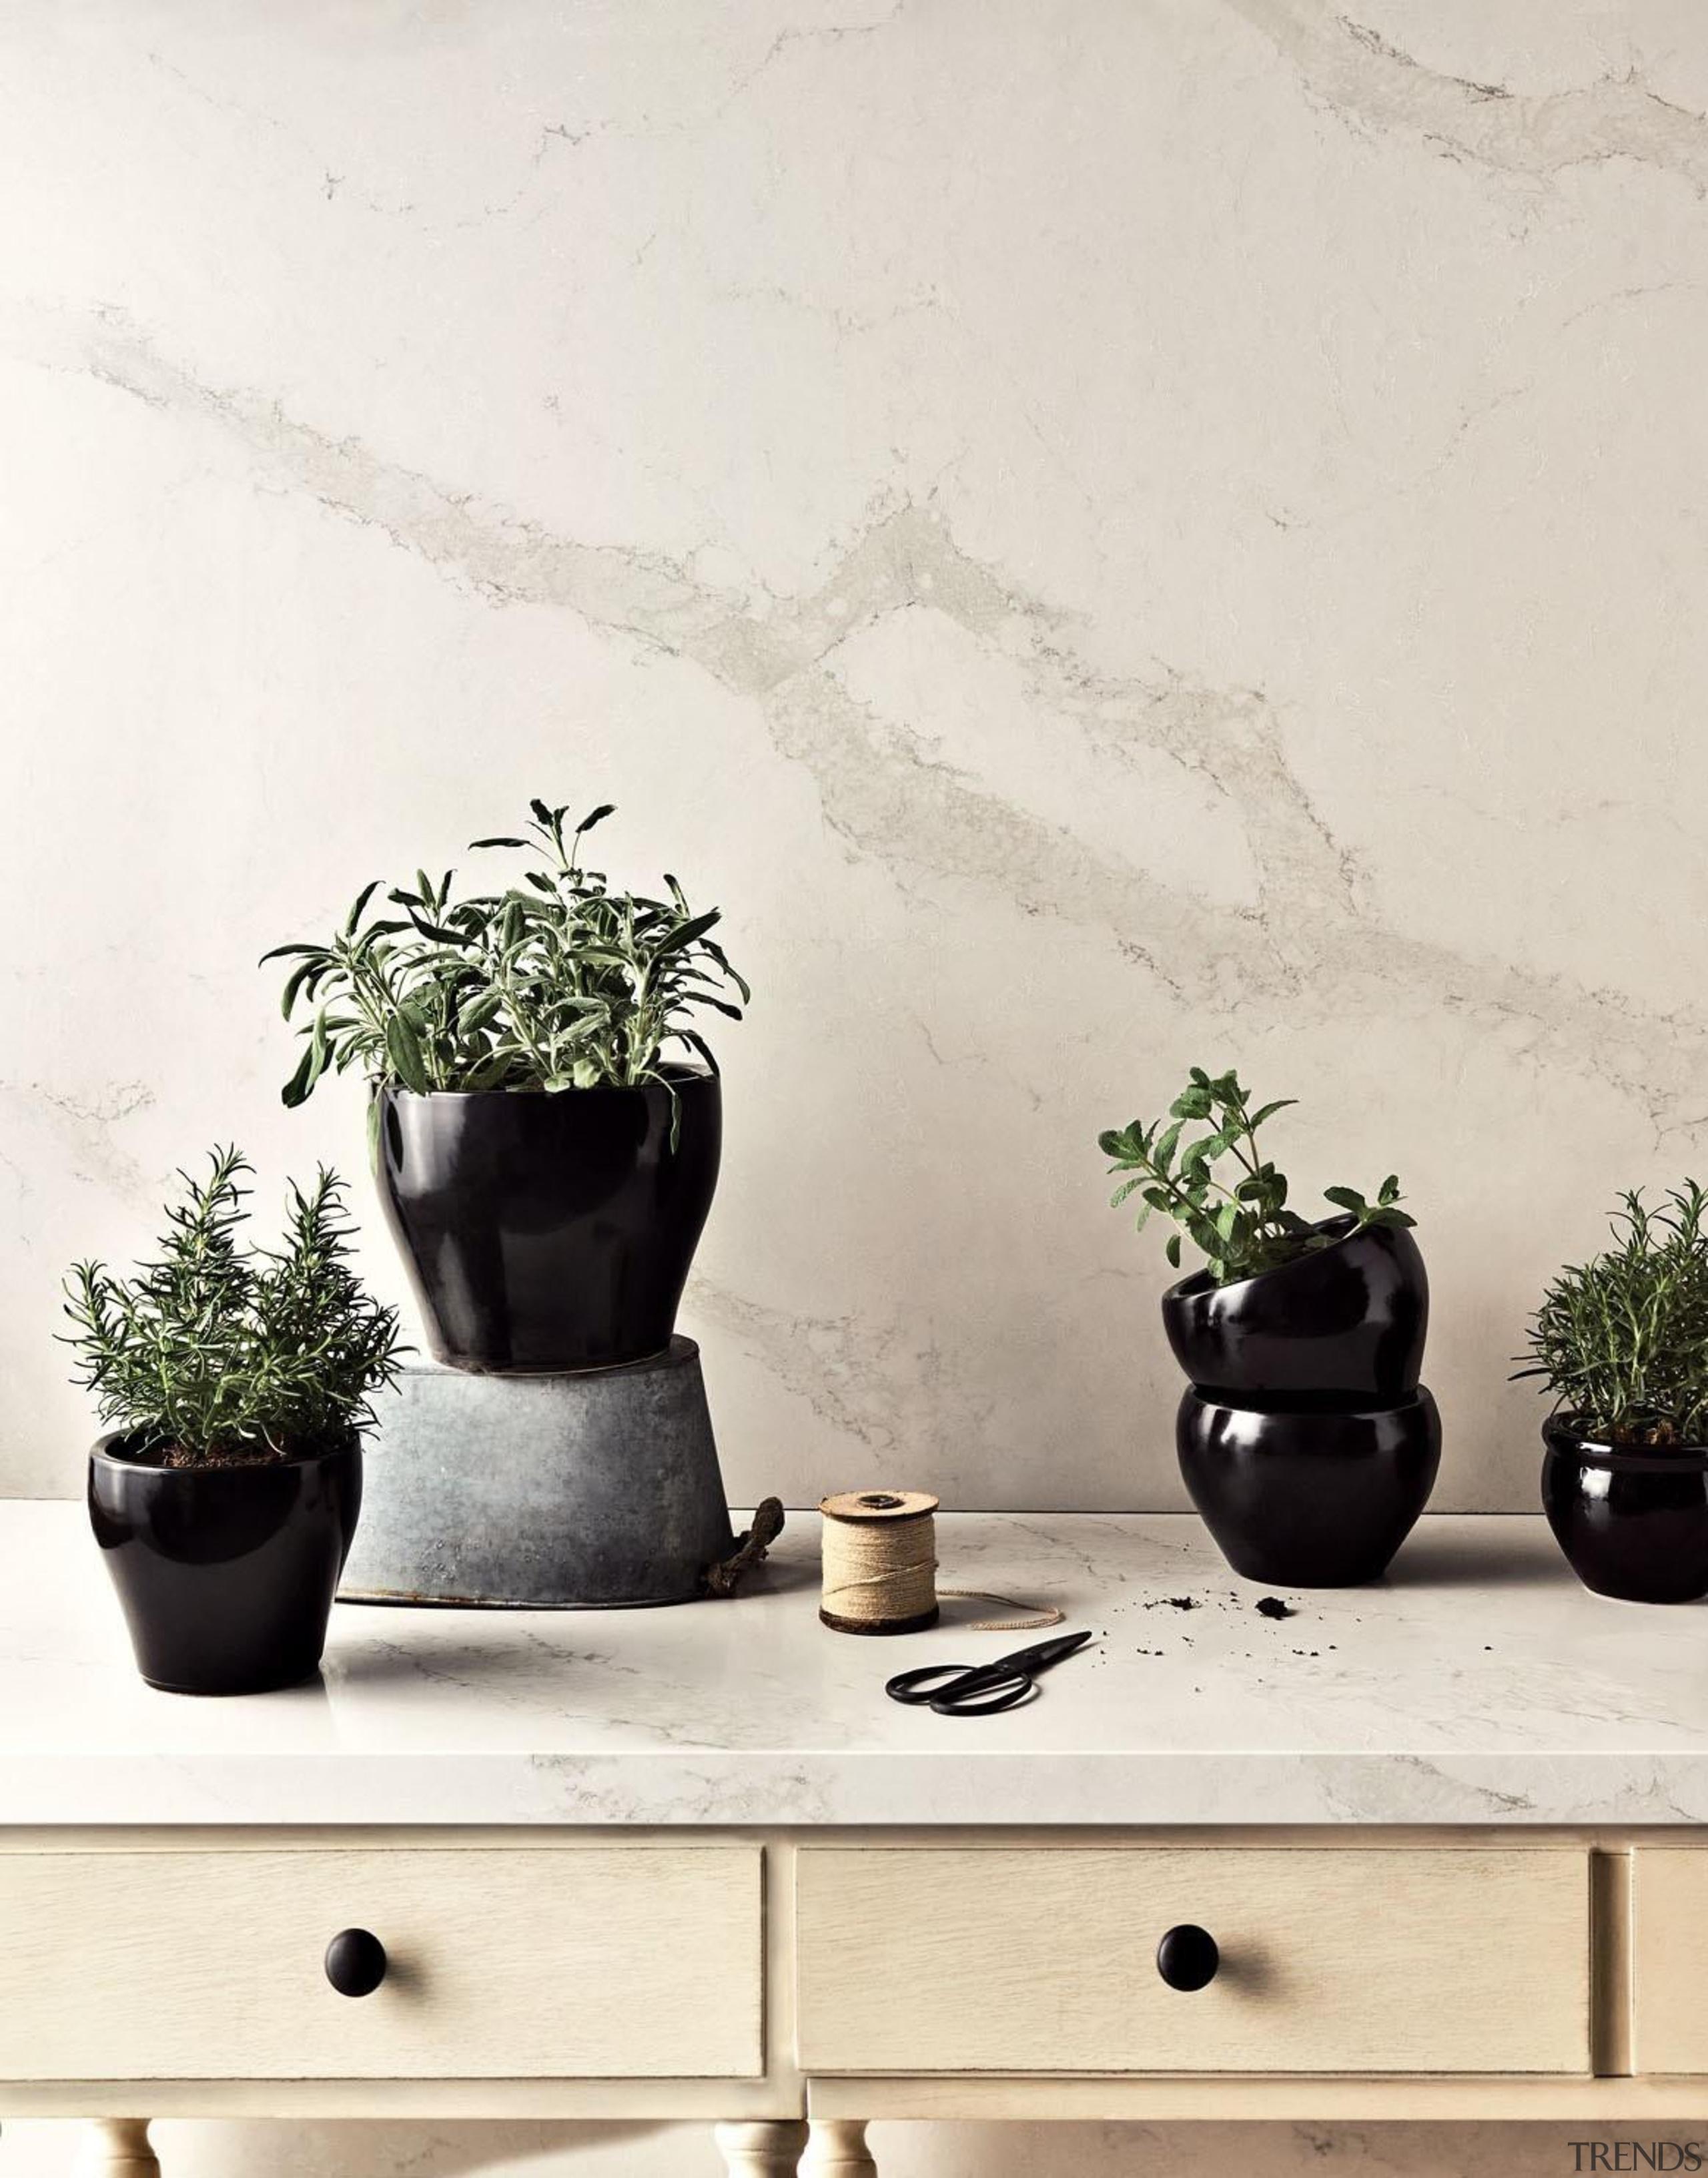 As Caesarstone's interpretation of natural Calacatta marble, Calacatta ceramic, flowerpot, houseplant, interior design, plant, product design, still life photography, table, vase, wall, white